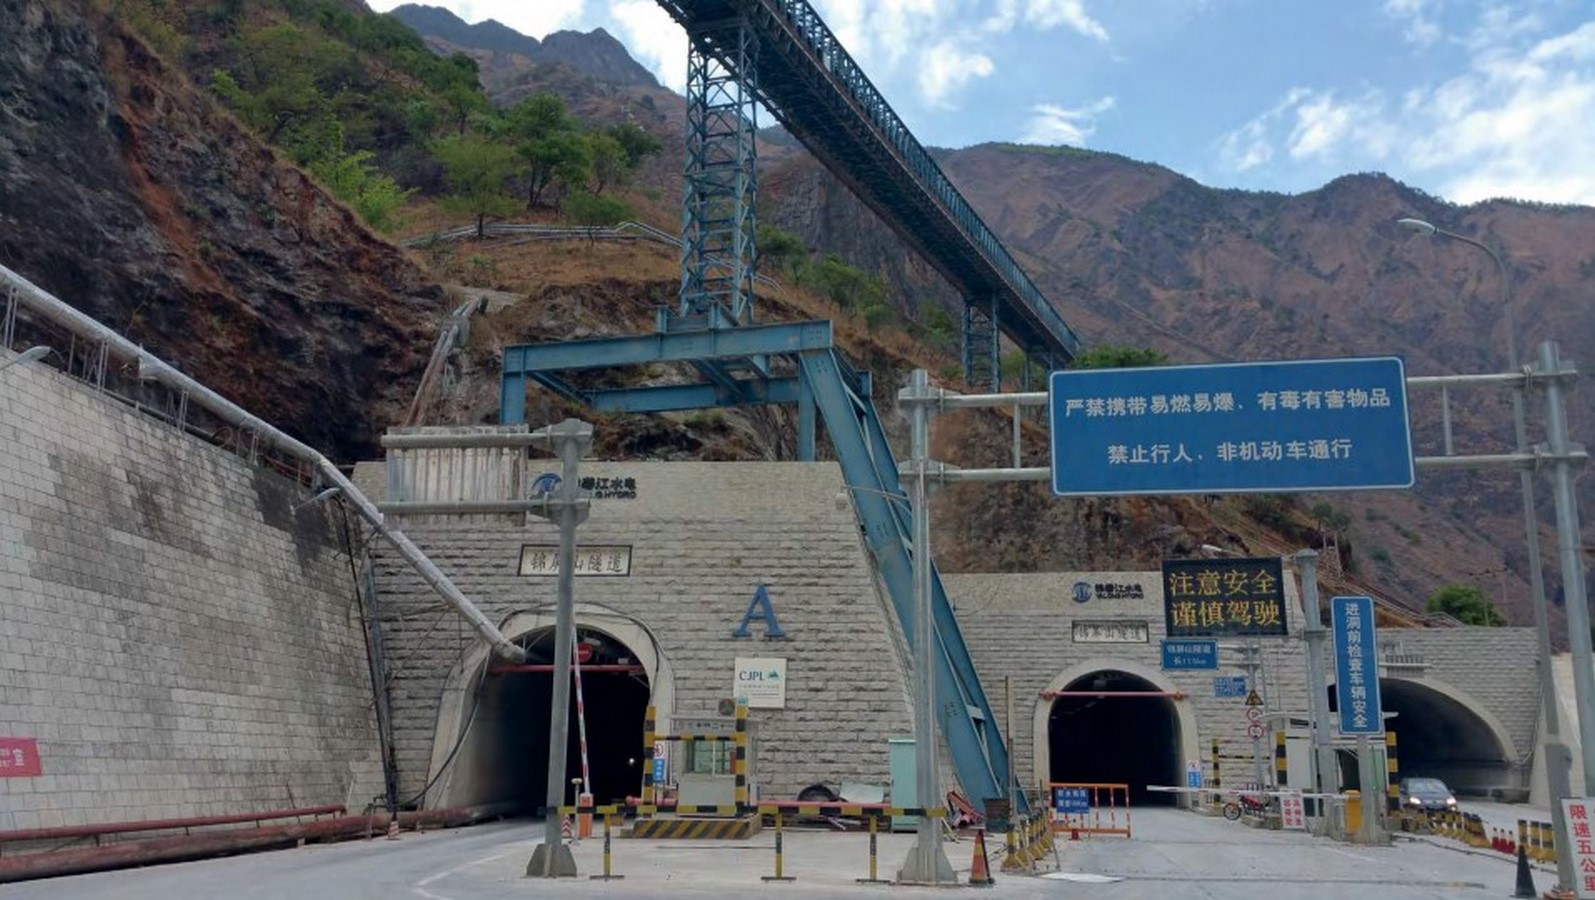 Jinping Underground Laboratory, China- The world deepest underground laboratory - Sheet3